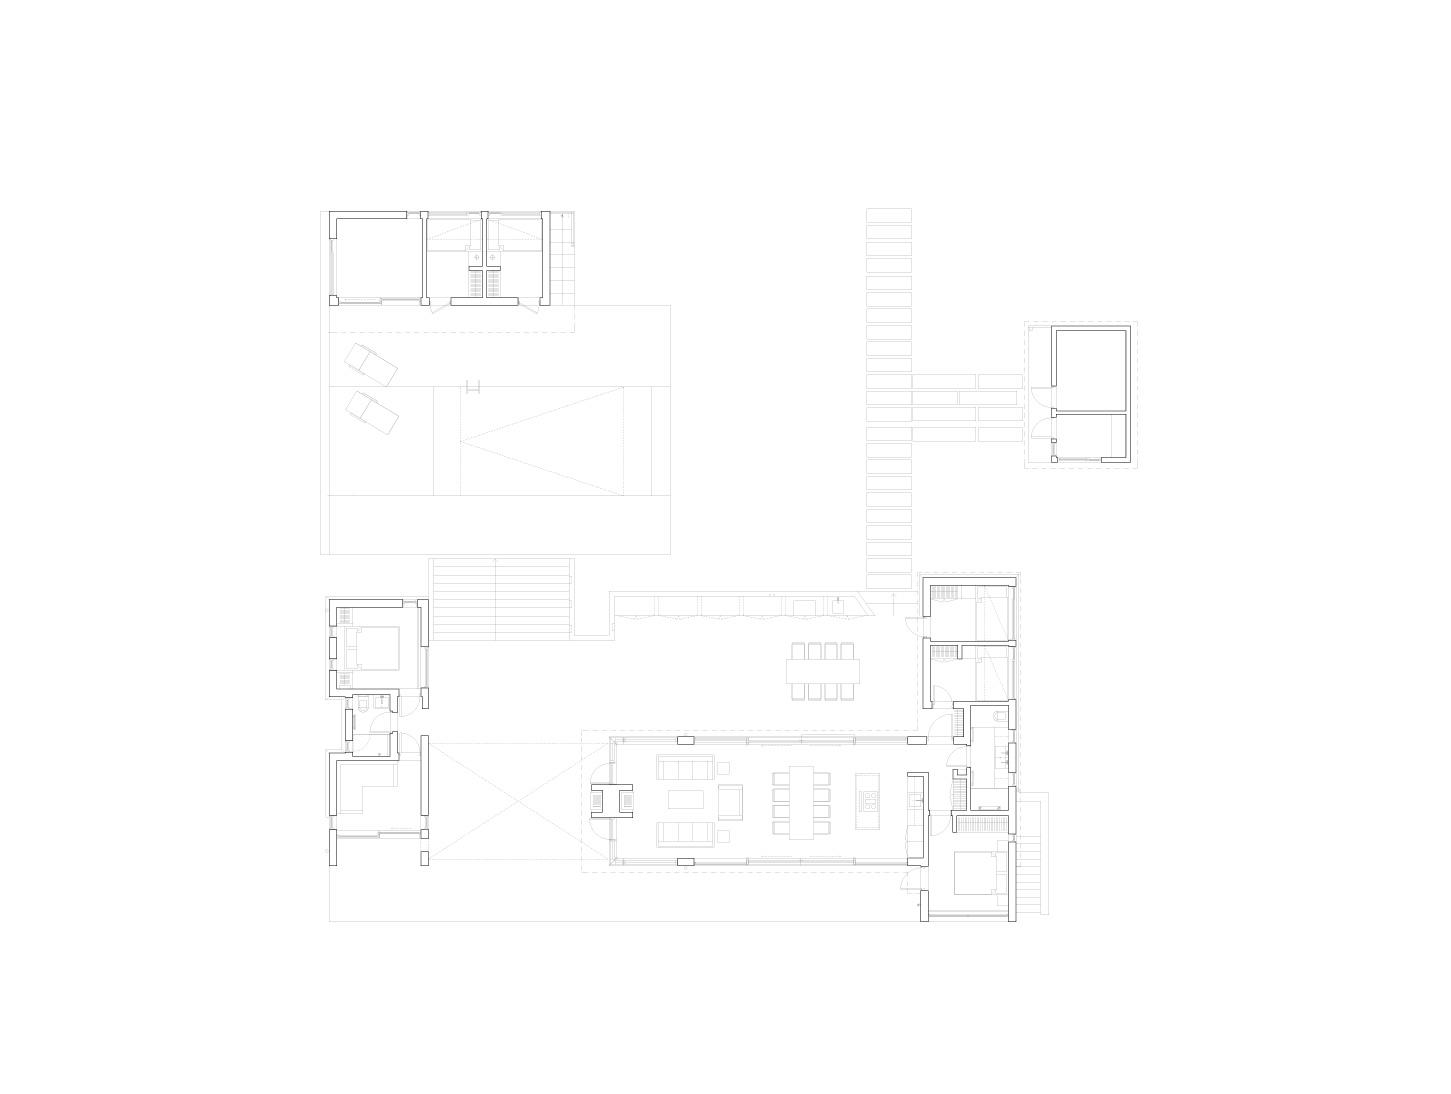 Jomfruland-Plan-2